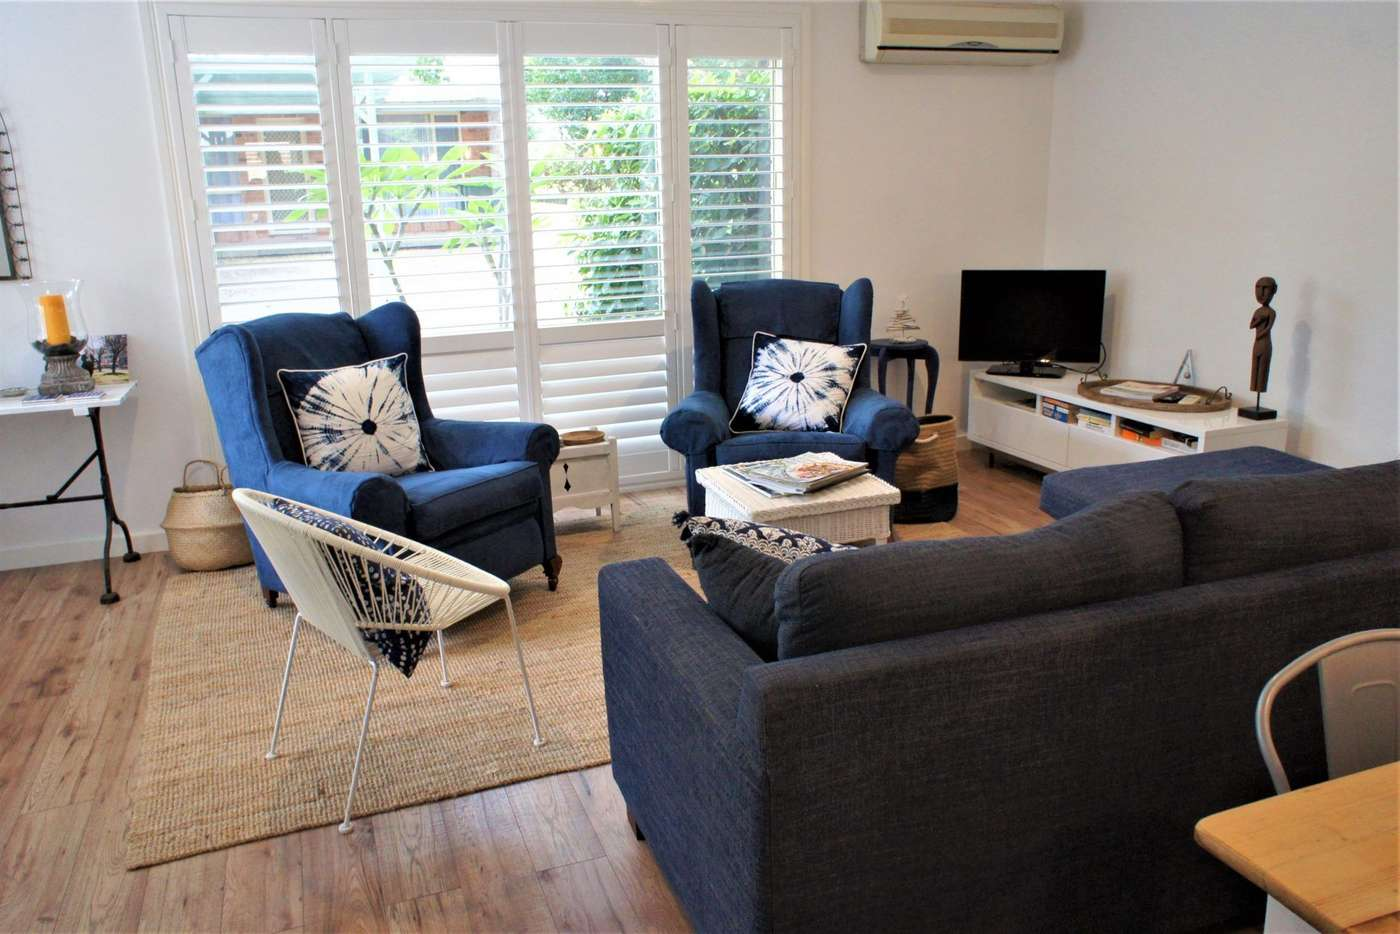 Main view of Homely villa listing, 10/130 Shoalhaven Street, Kiama NSW 2533